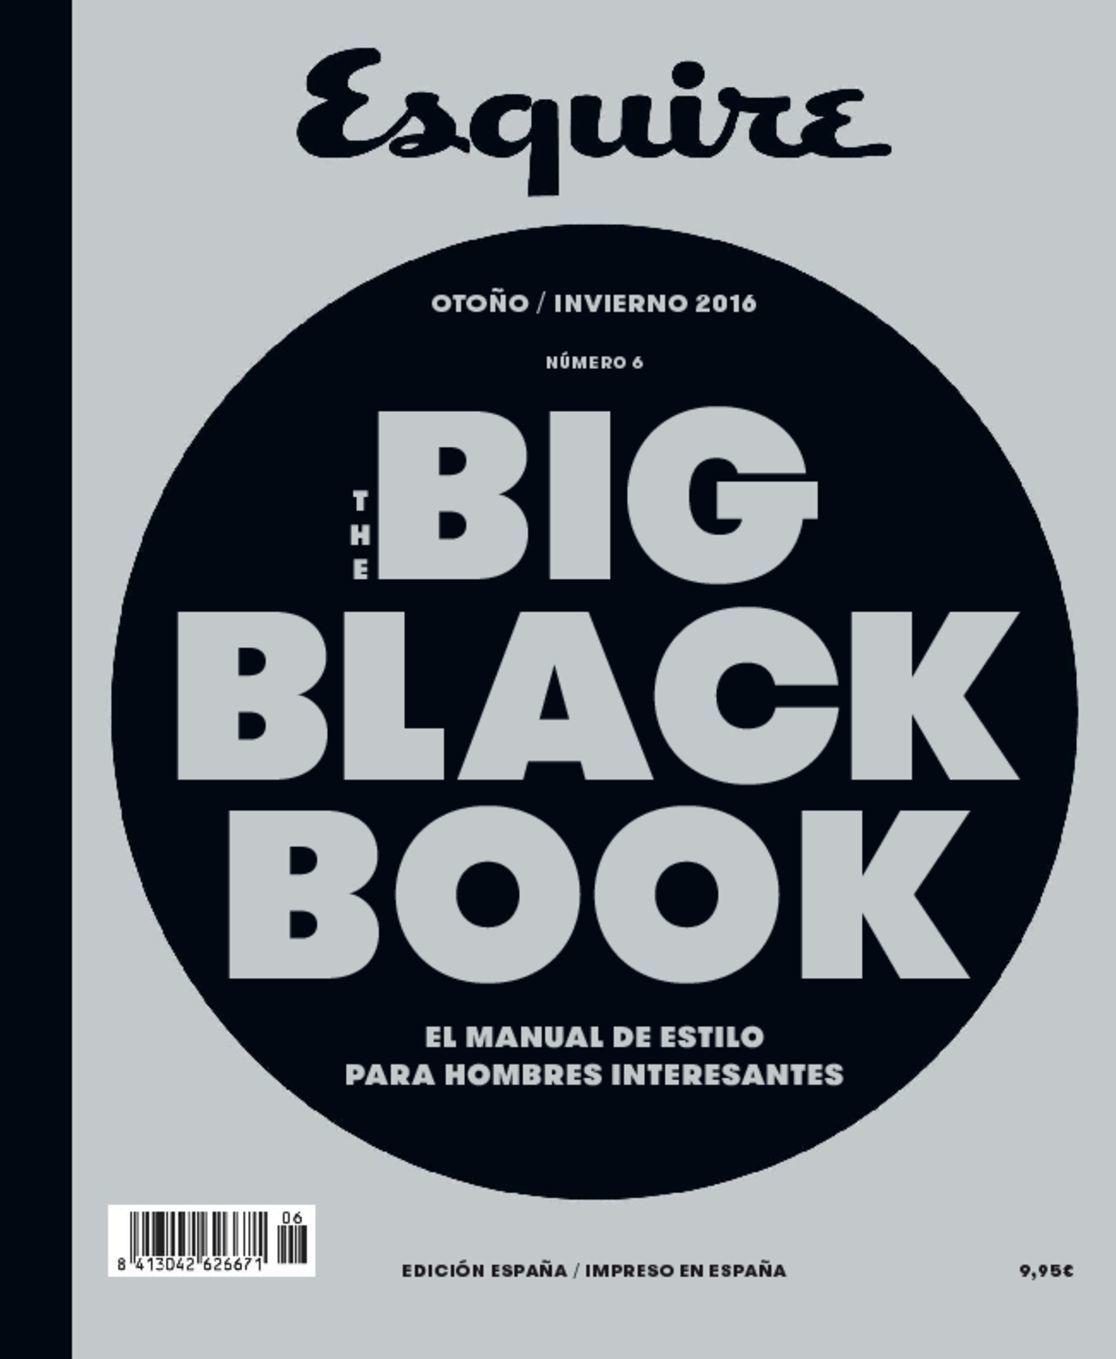 Black Book Cover Images : The big black book españa magazine digital